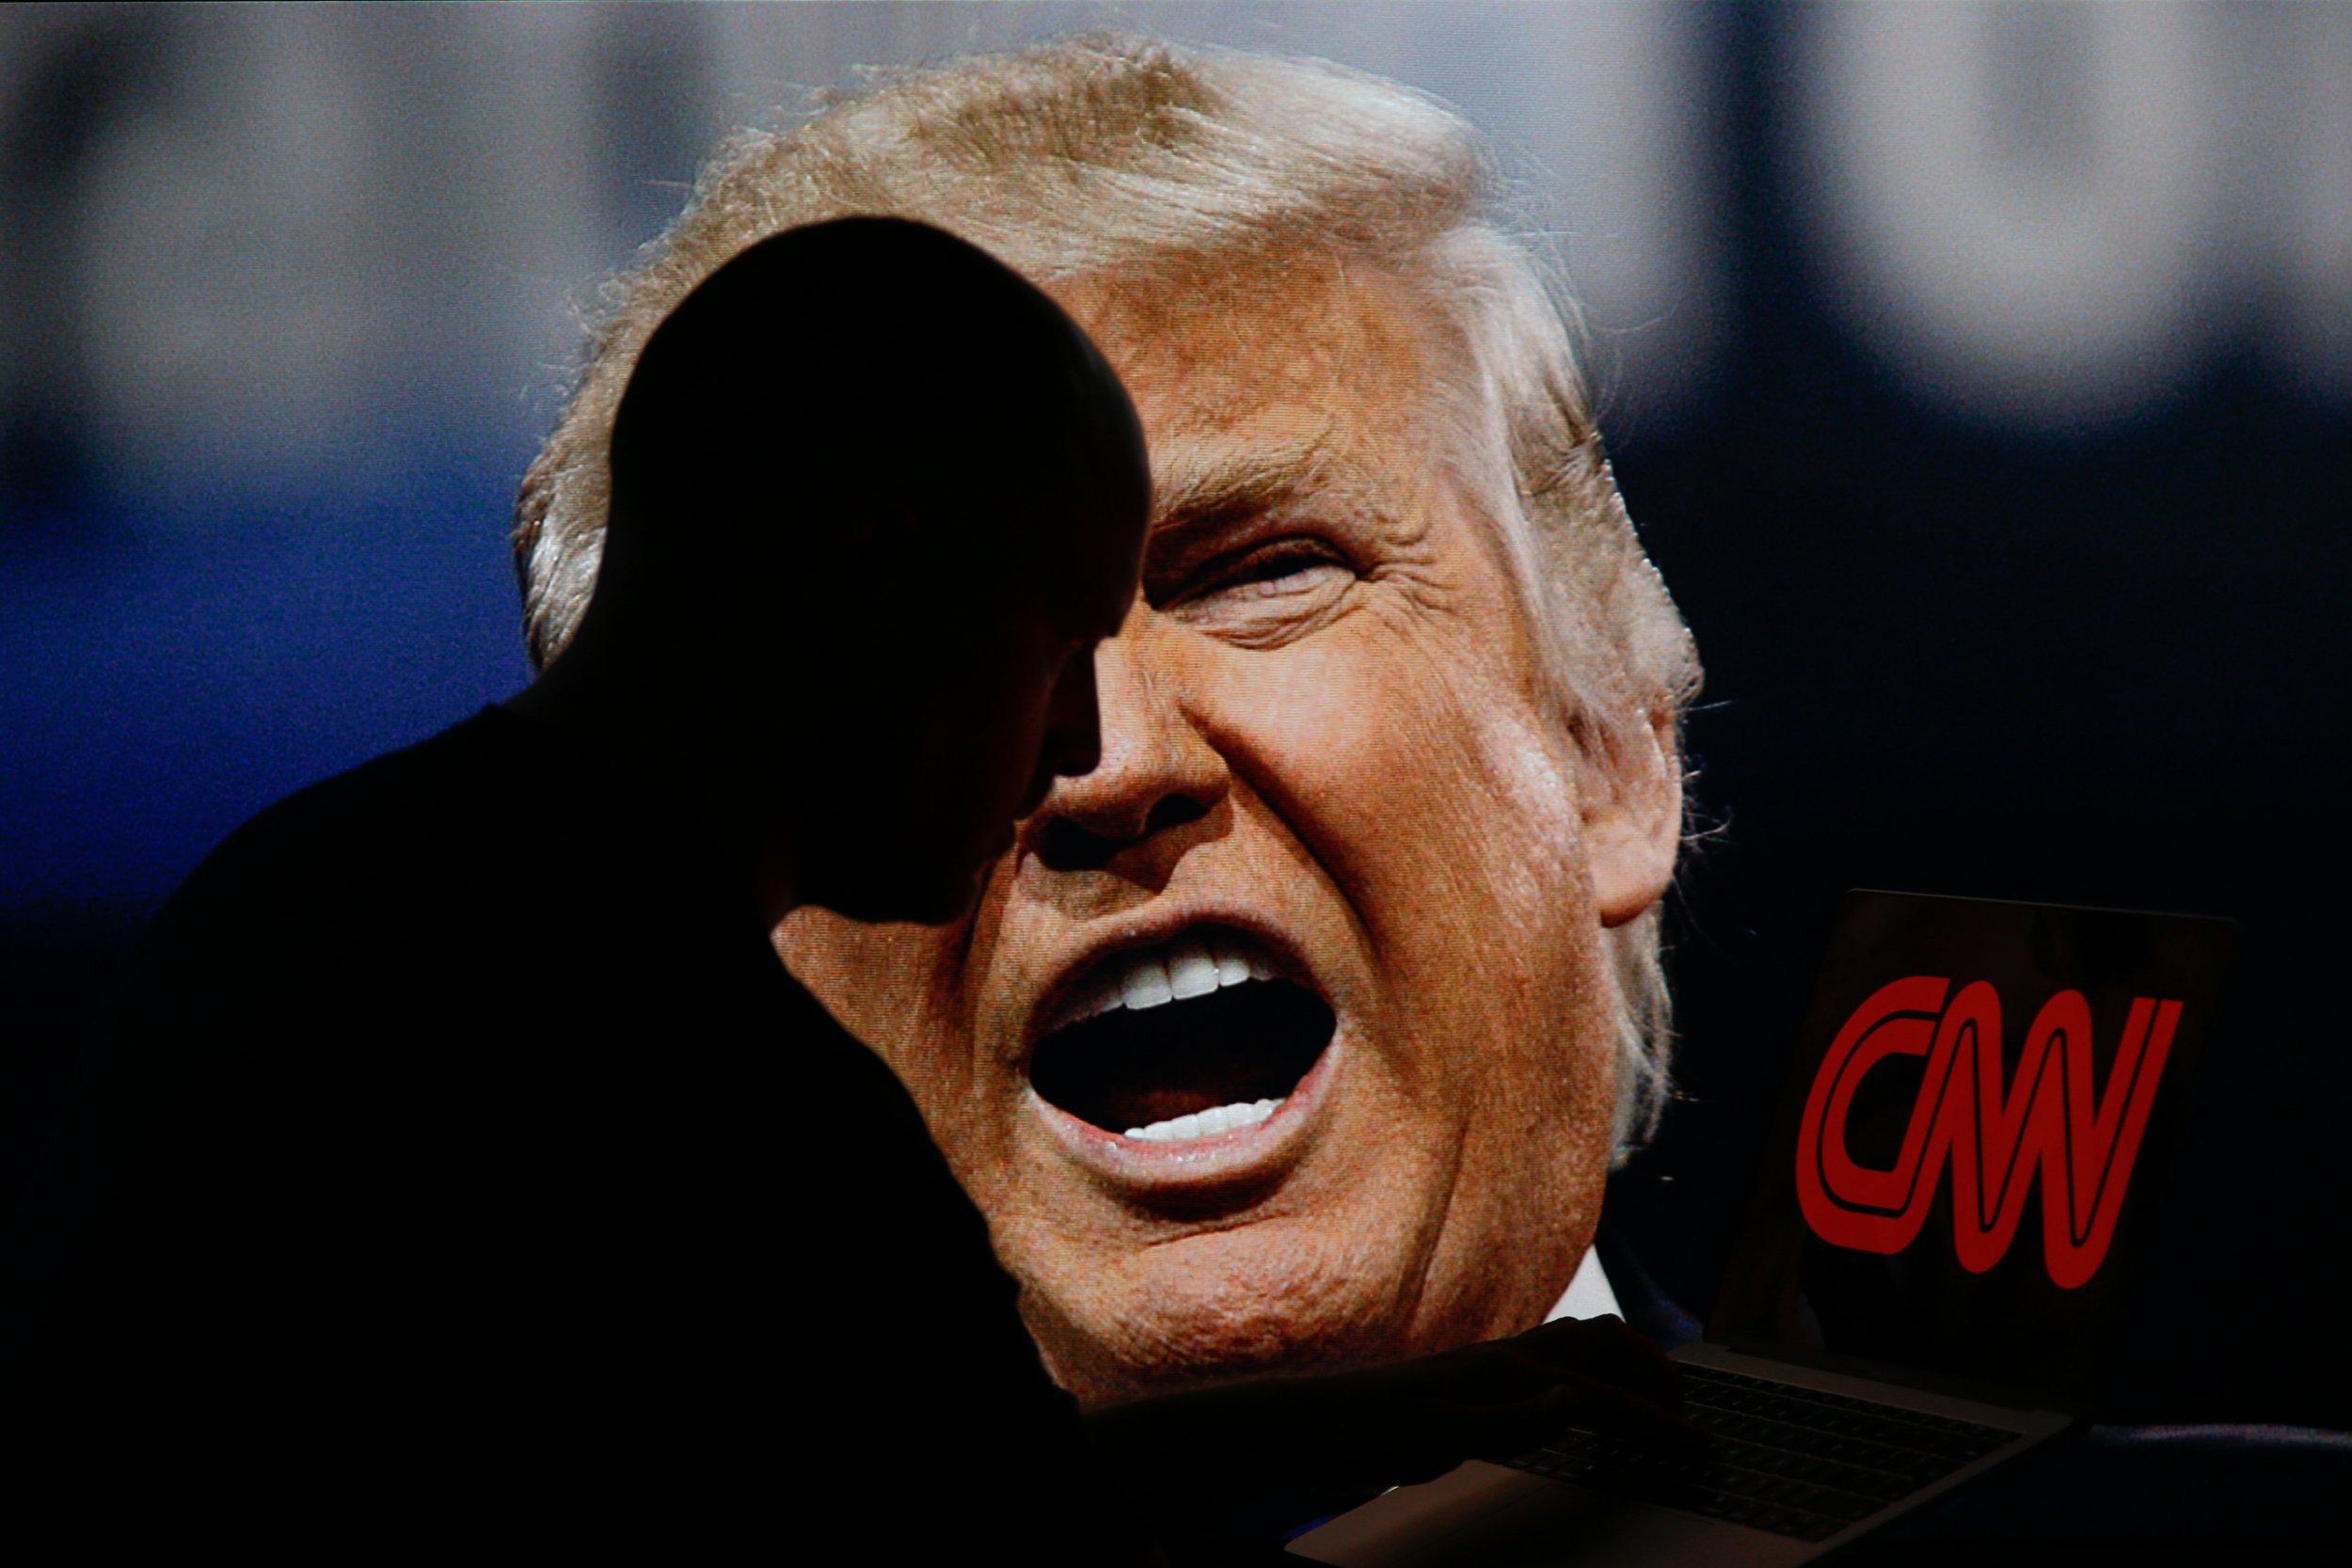 Donald Trump postpones Fake News Awards as tell-all book firestorm rages on